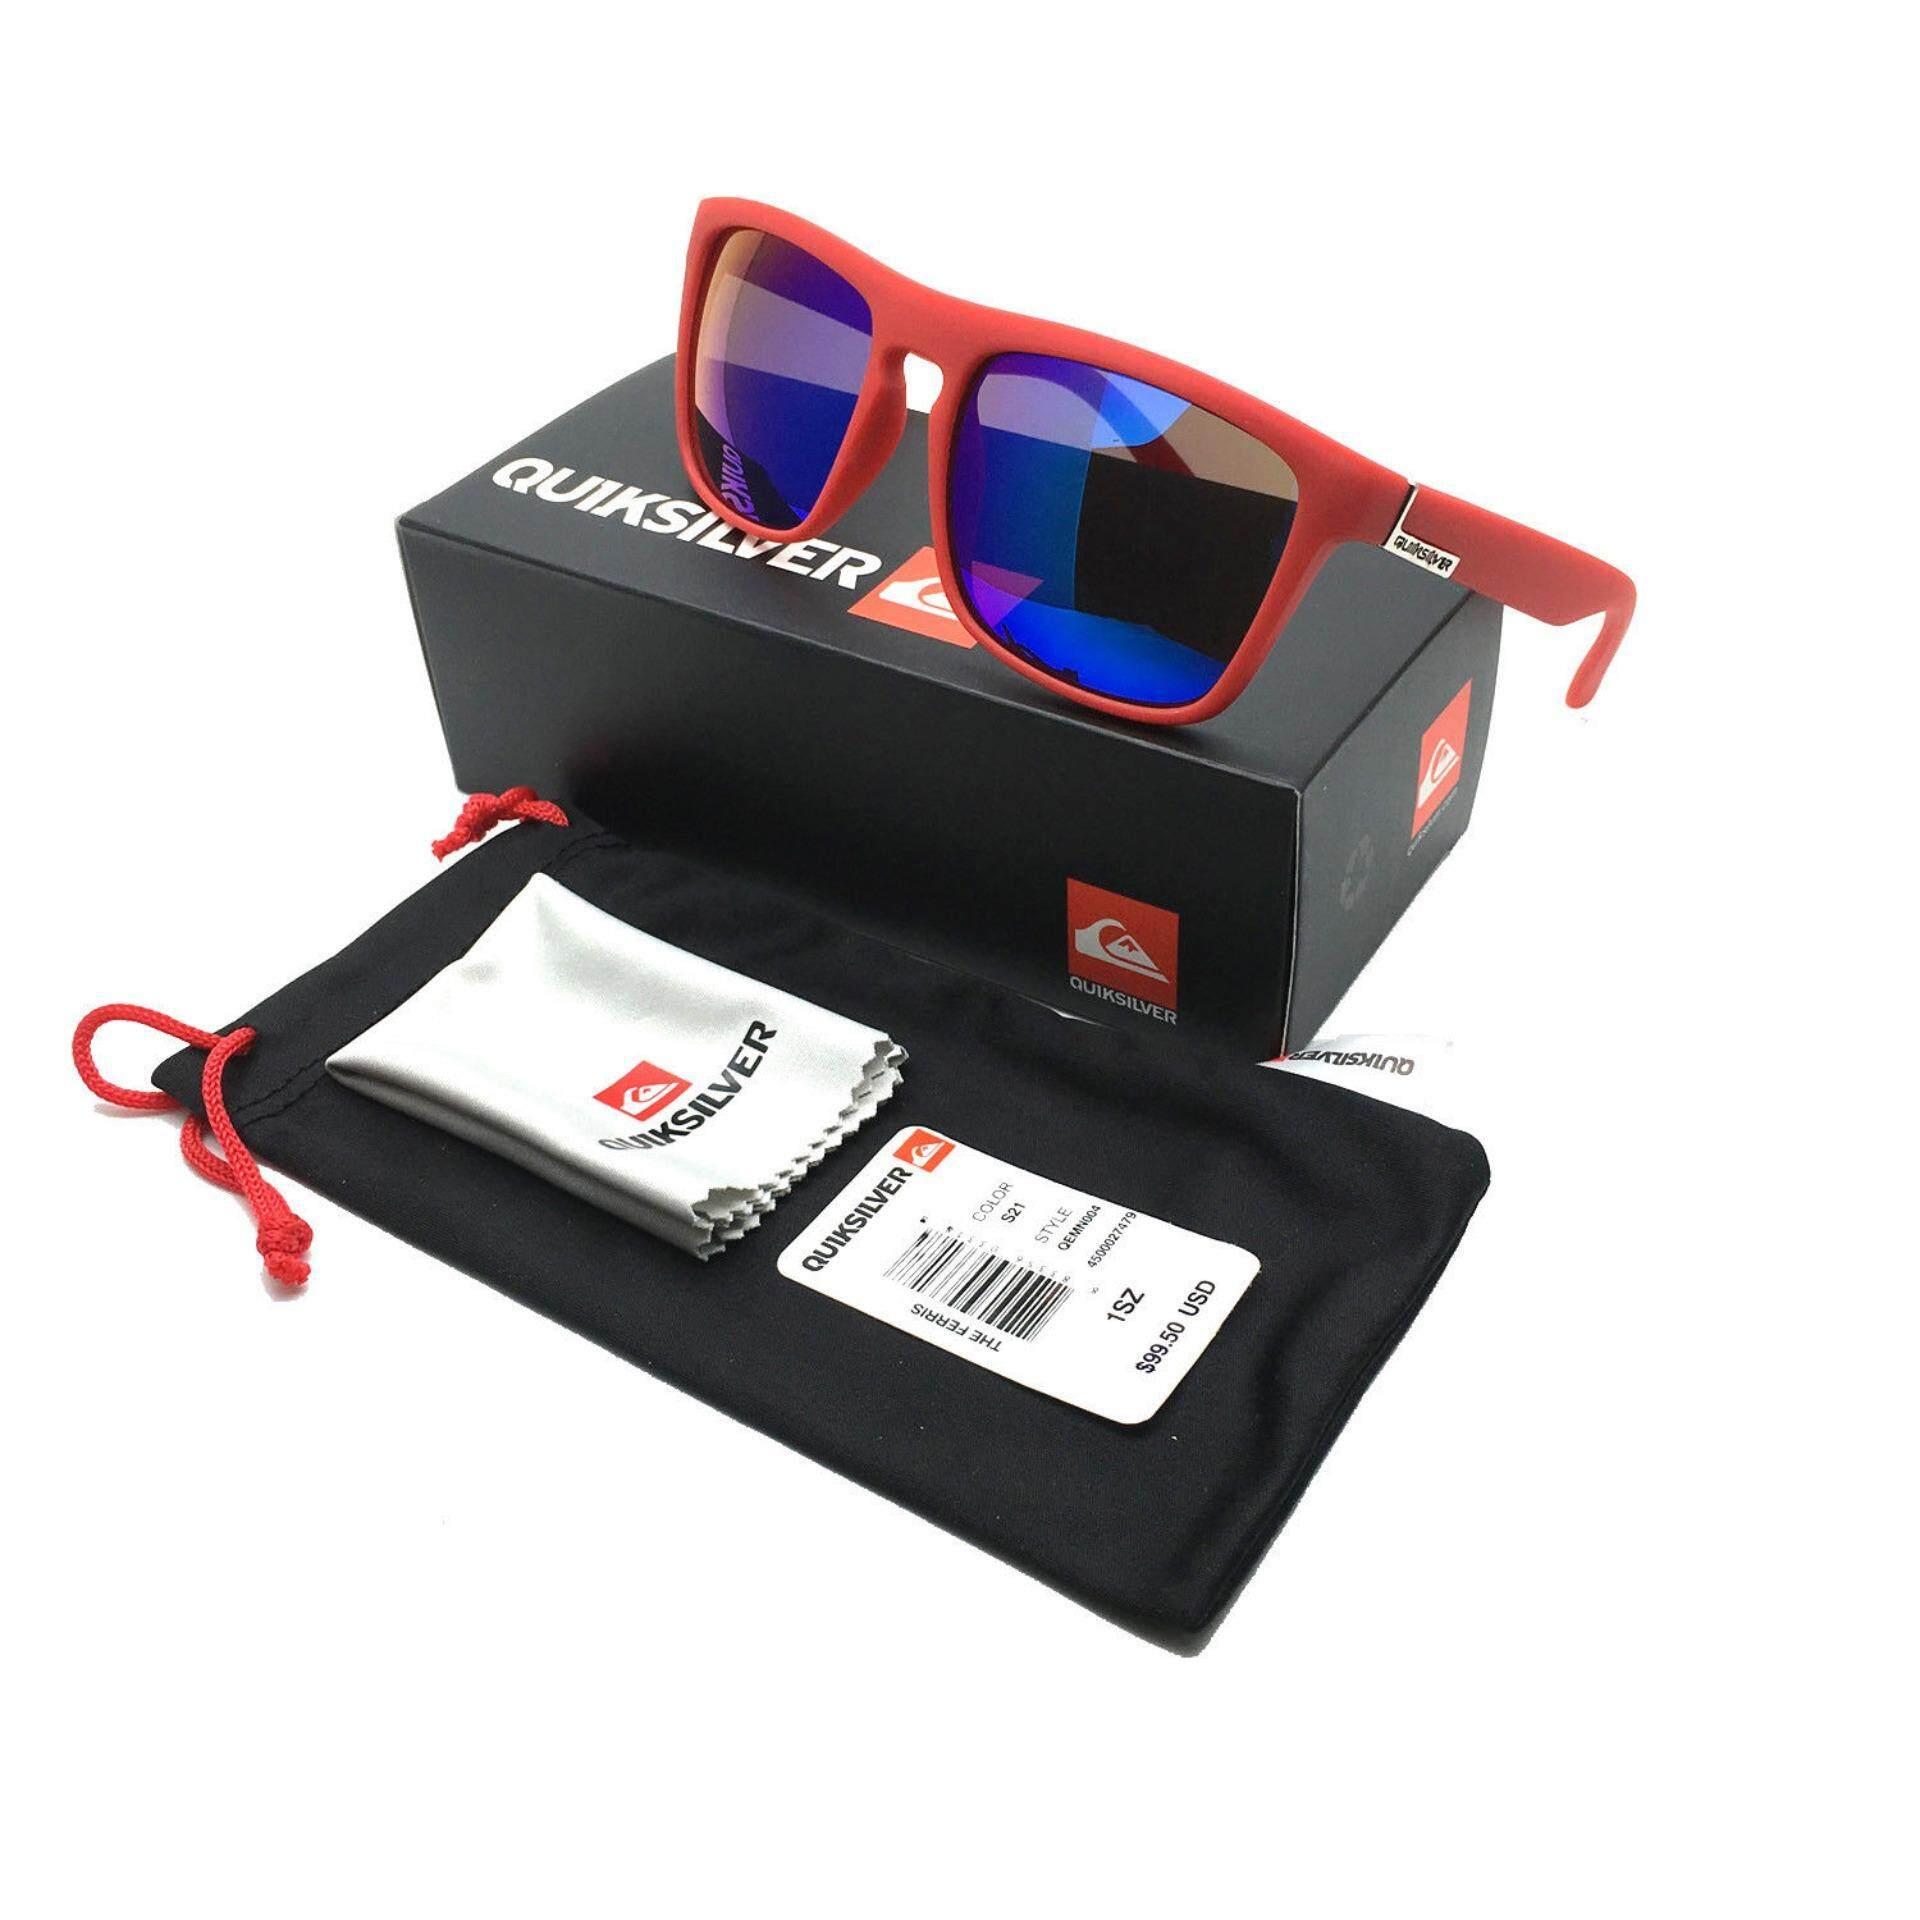 f8711220a5c8b Stylish Men Women Outdoor Sunglasses UV400 Lightweight Clean Vision  Sunglasses